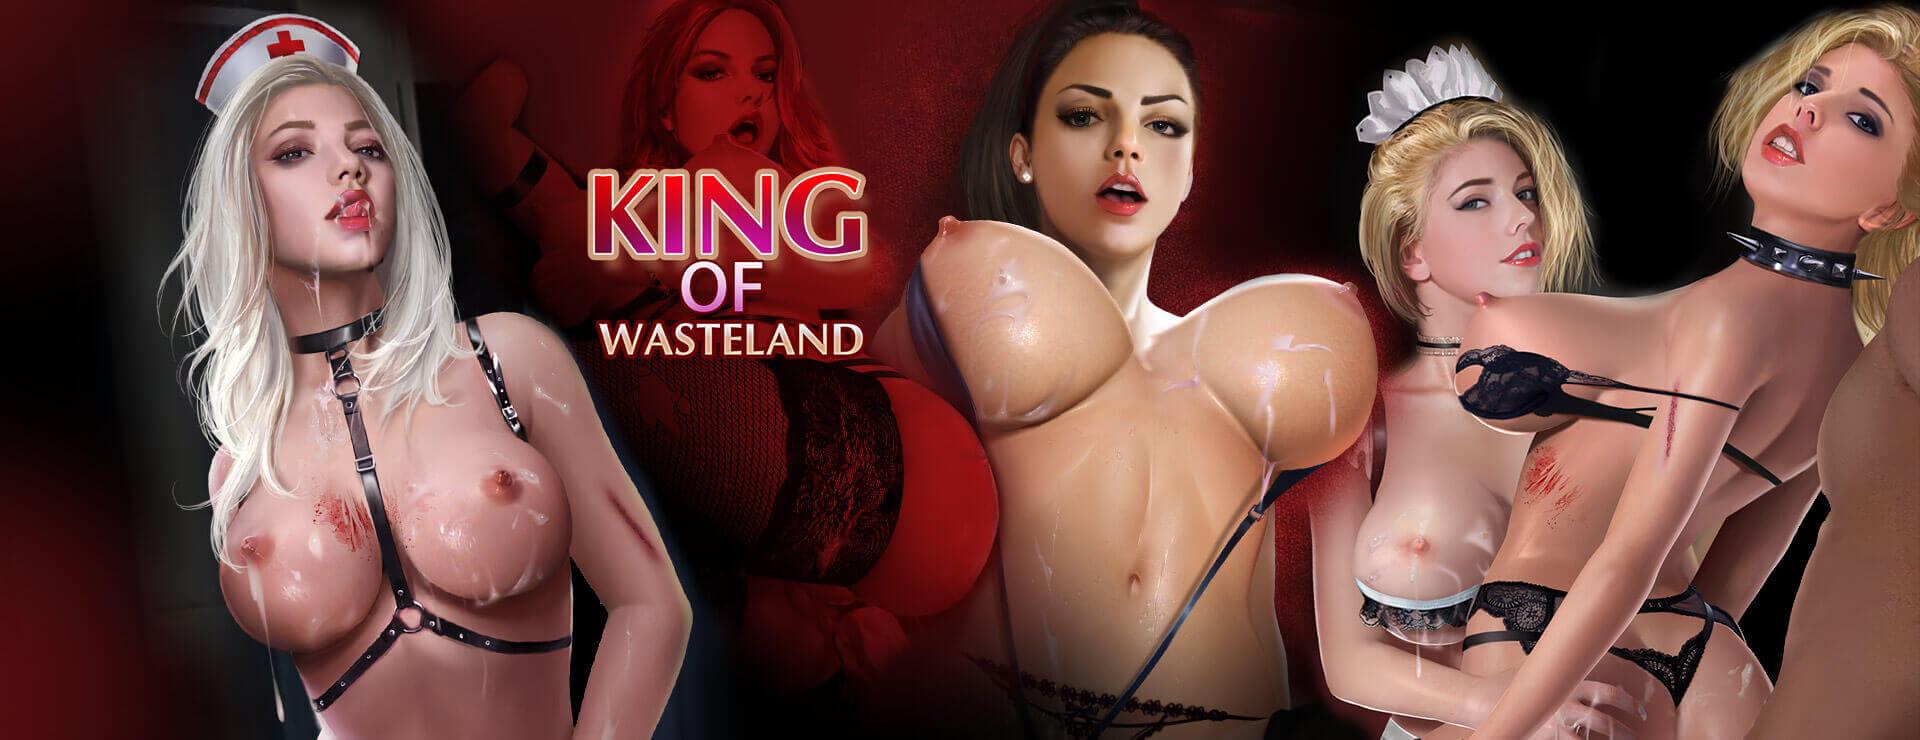 King of Wasteland - Simulation Game